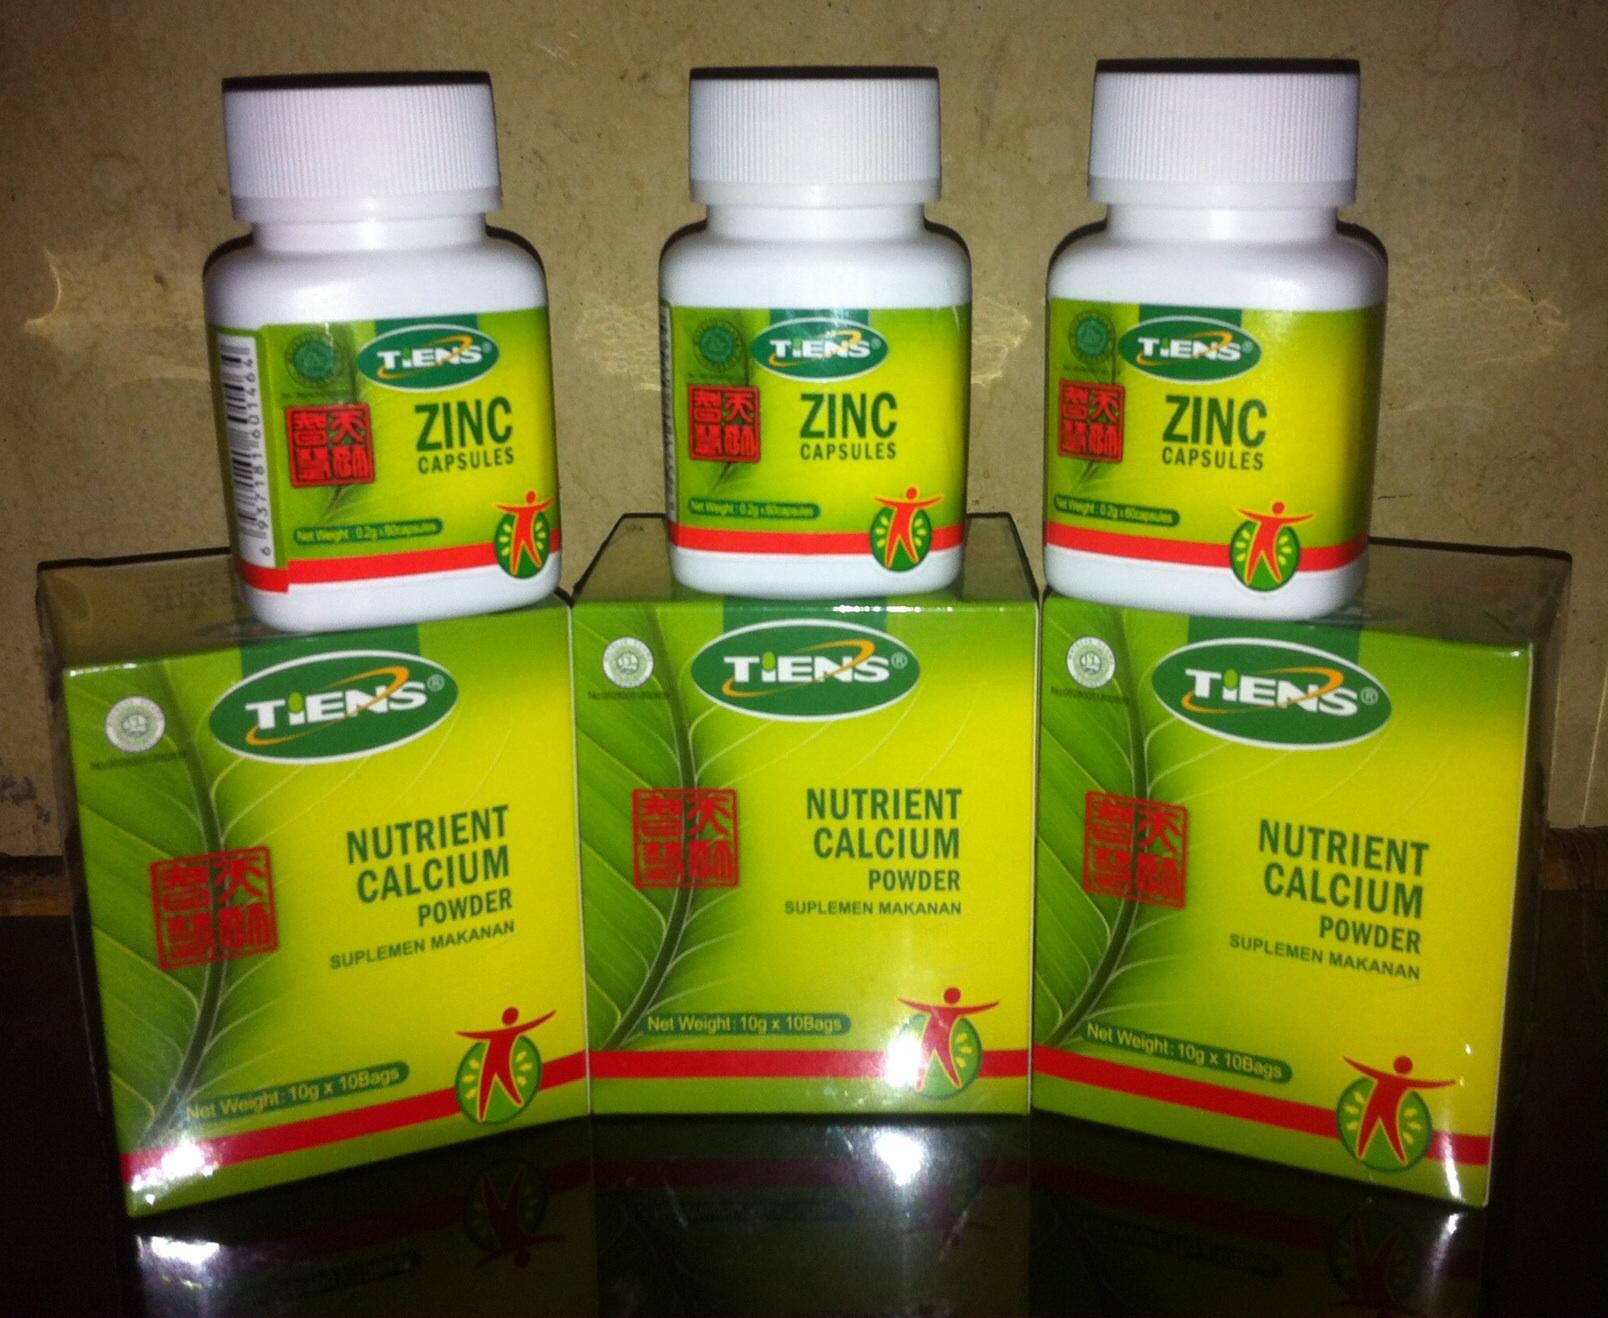 harga Obat Peninggi Badan Tiens Paket 30hari Alami NHCP Susu Kalsium Zinc Tokopedia.com